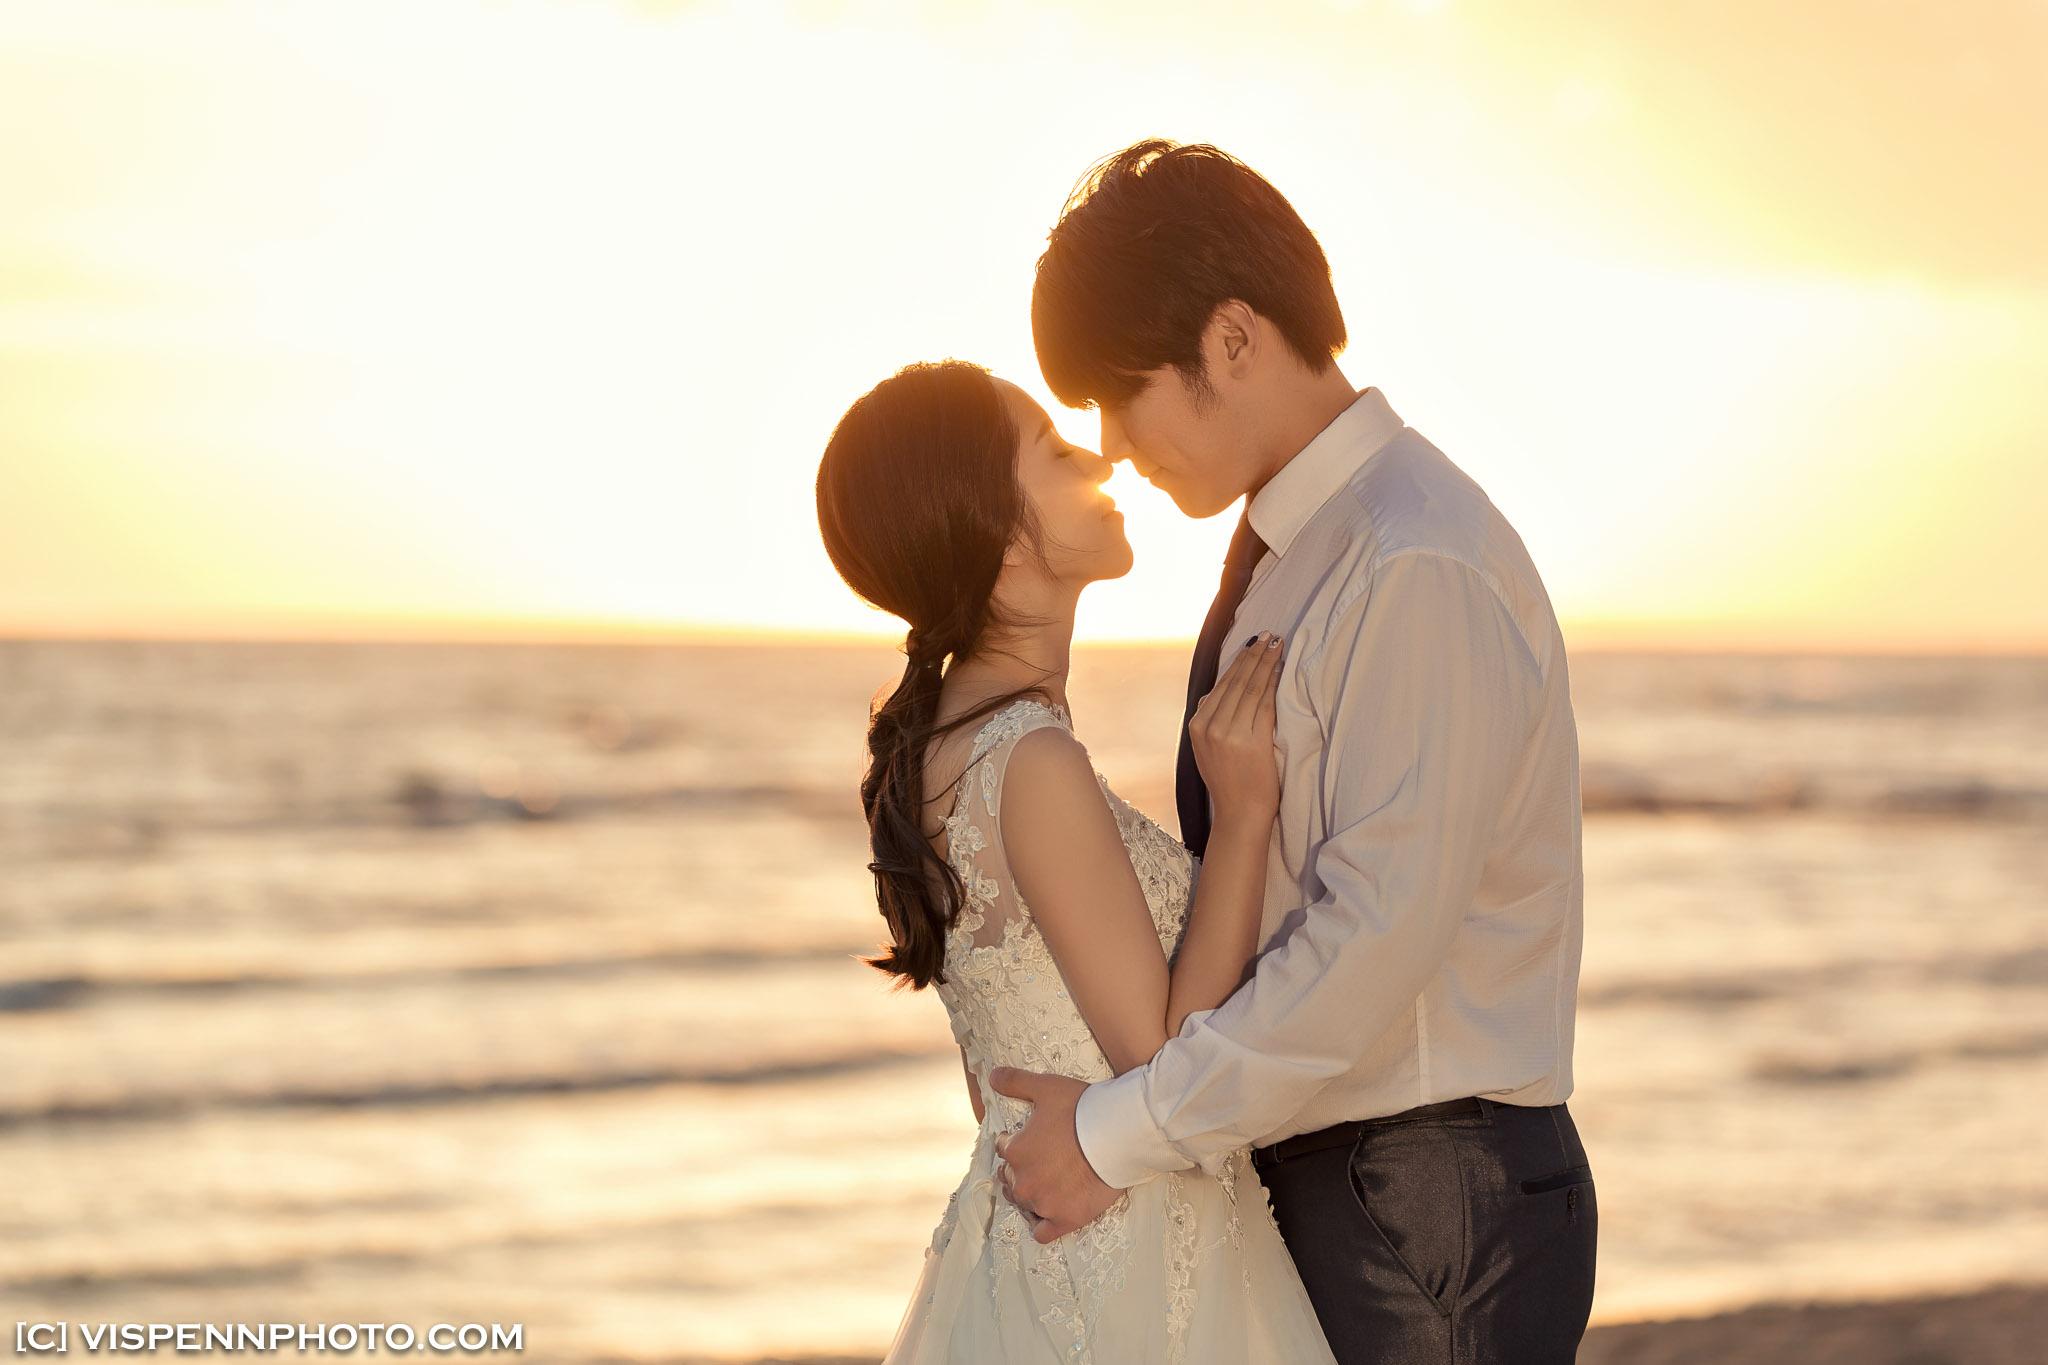 PRE WEDDING Photography Melbourne VISPENN 墨尔本 婚纱照 结婚照 婚纱摄影 VISPENN SuZhengWei 2172